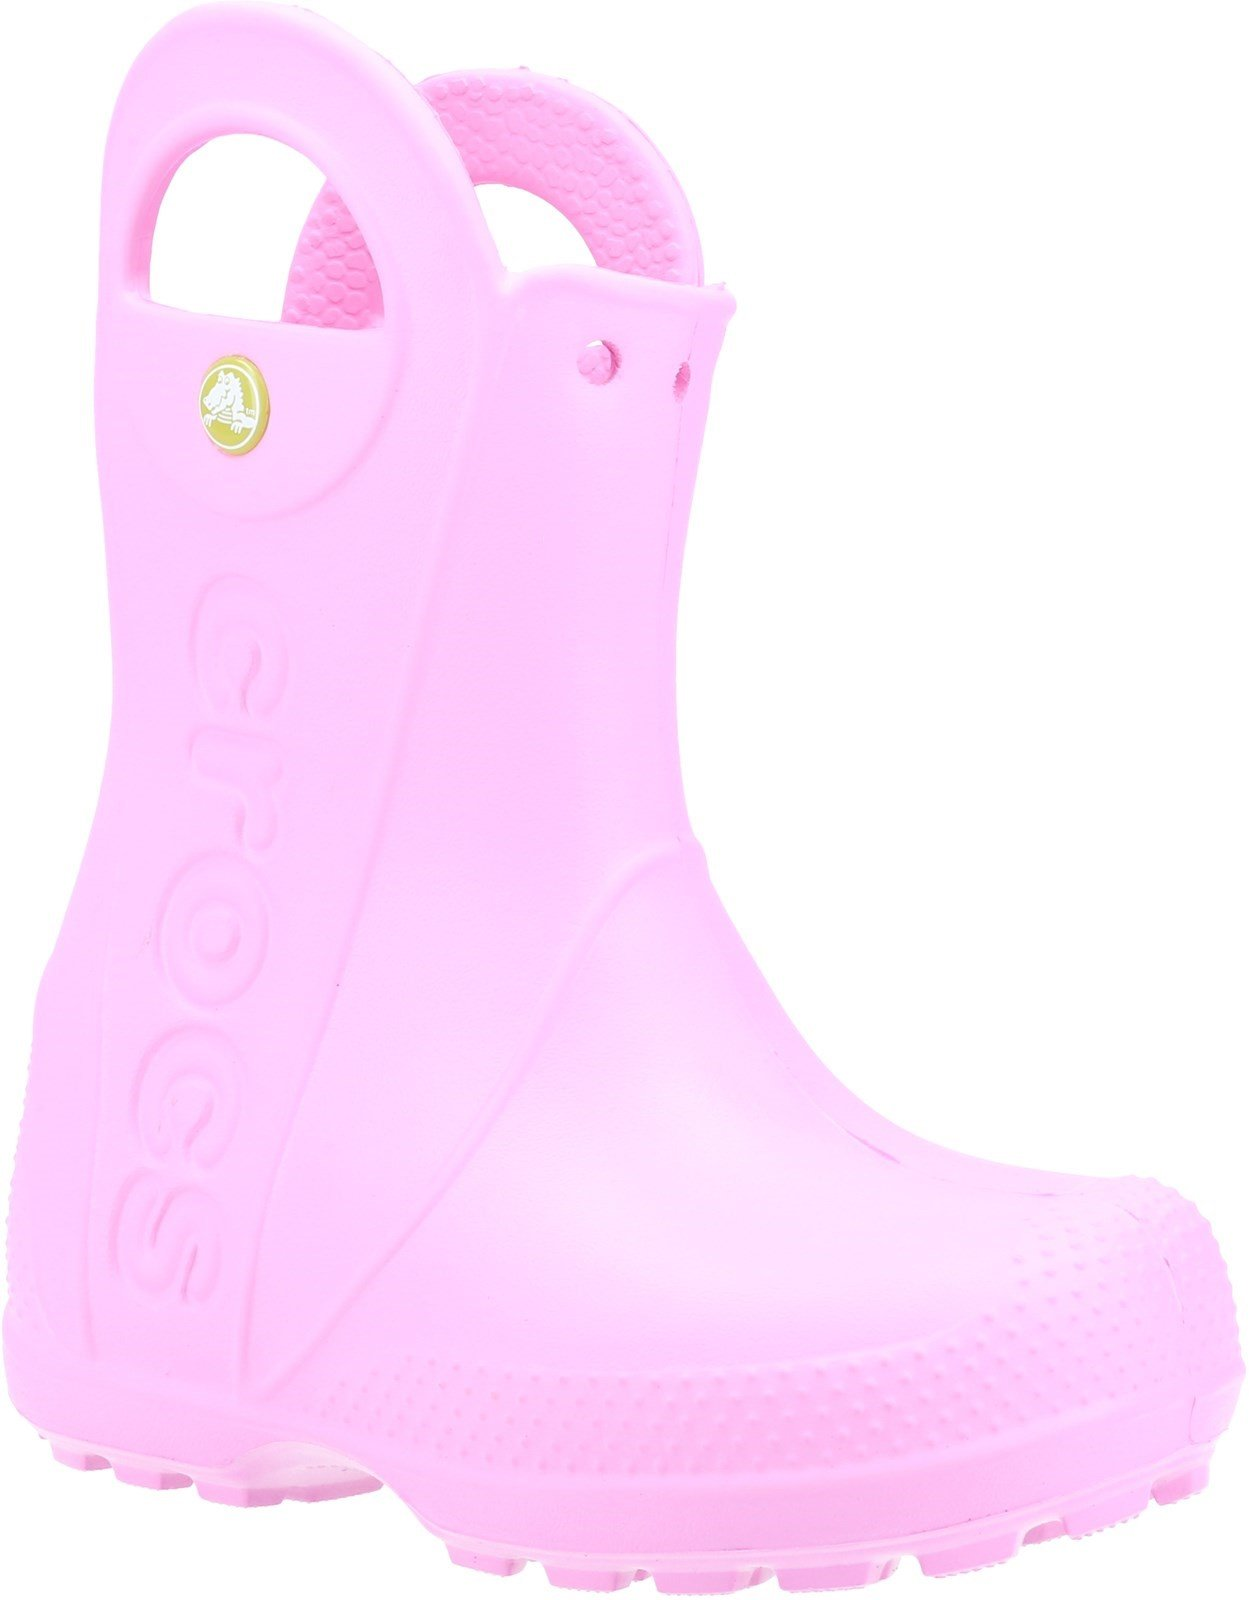 Crocs Kid's Handle It Rain Boot Carnation 21080 - Carnation 6